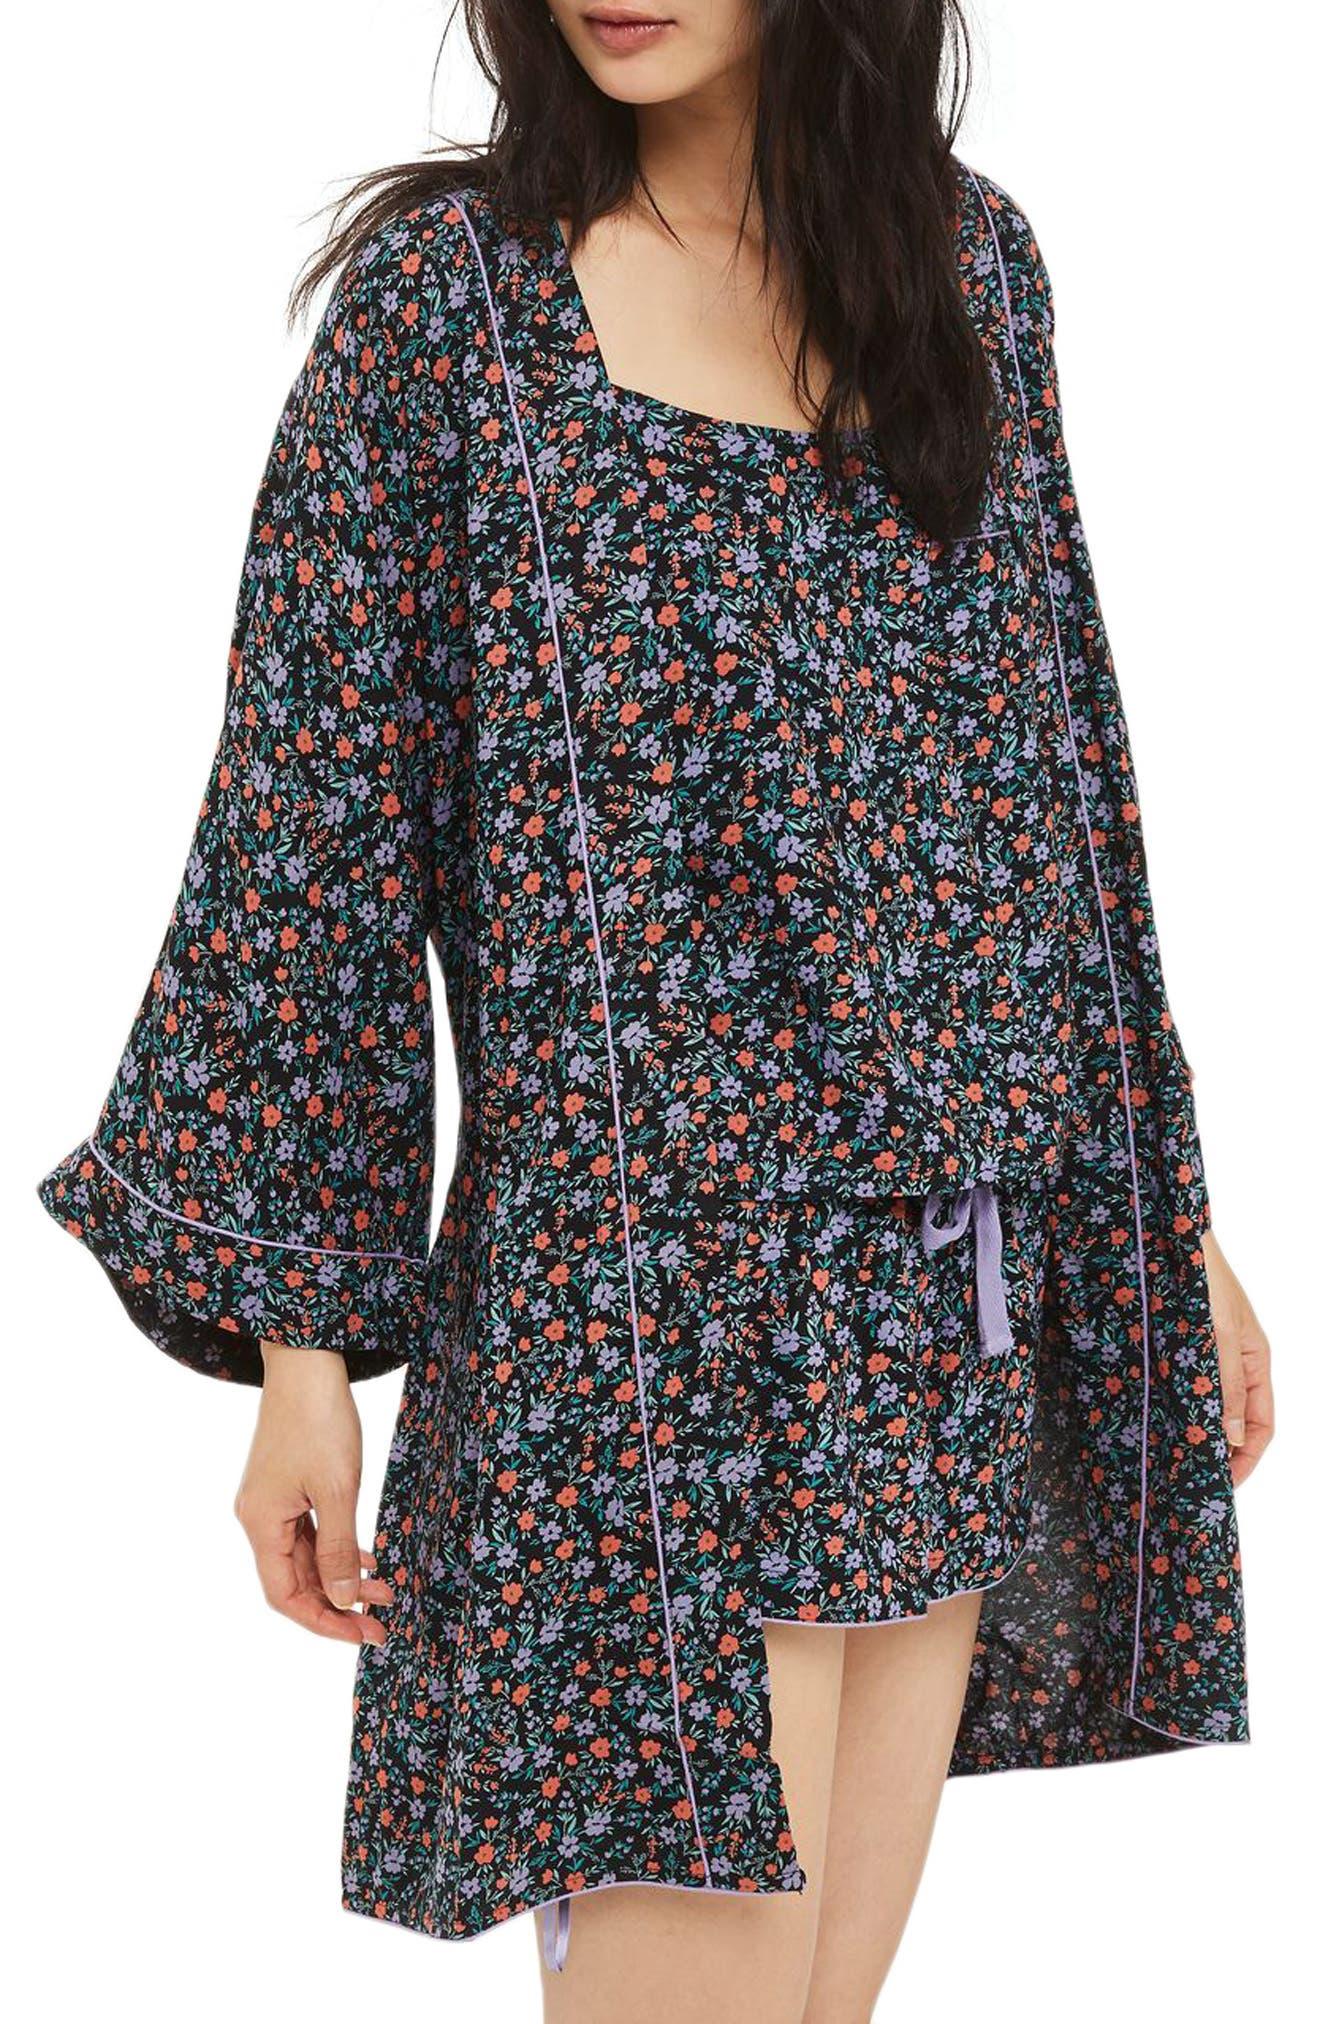 Topshop Ditsy Floral Print Robe